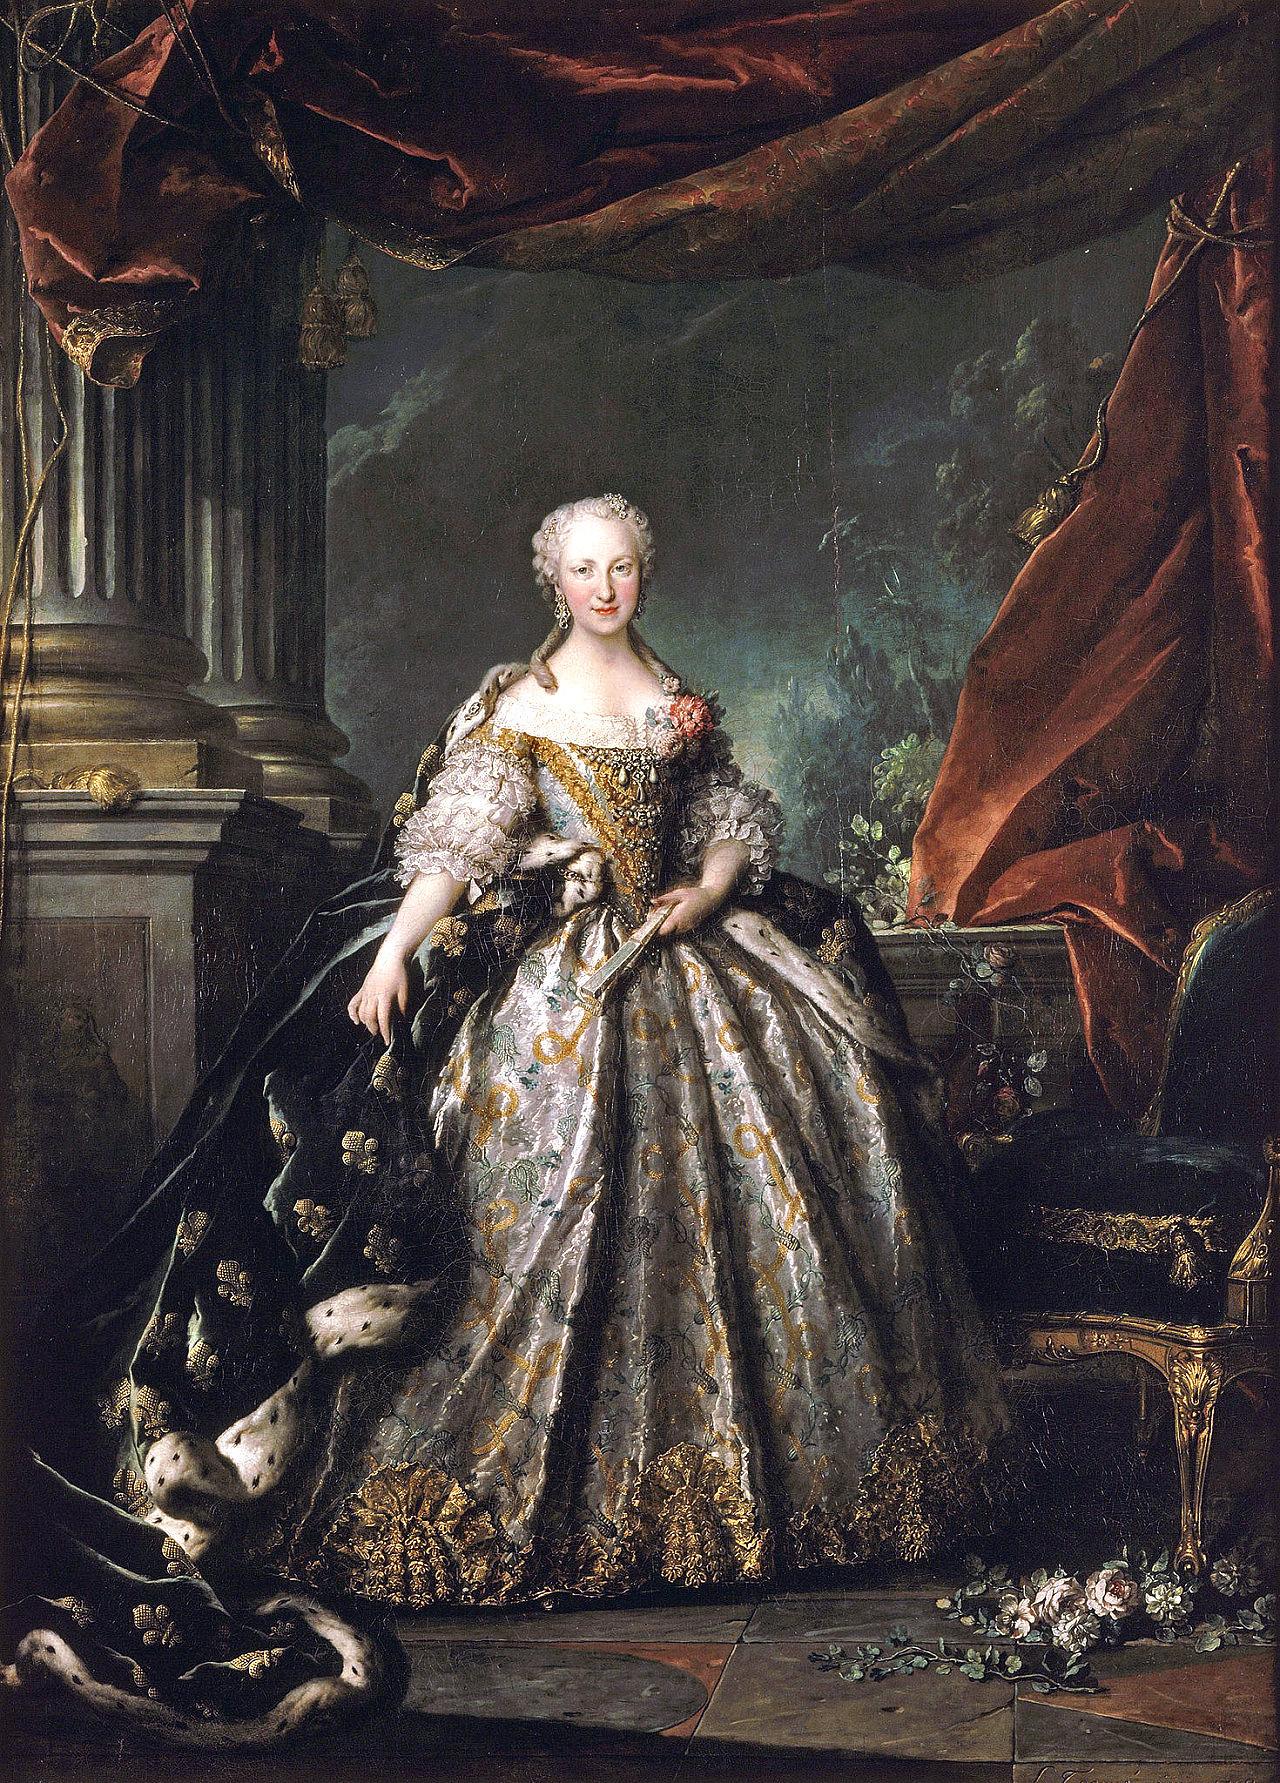 https://i2.wp.com/upload.wikimedia.org/wikipedia/commons/7/79/Mar%C3%ADa_Teresa_Rafaela_of_Spain.jpg